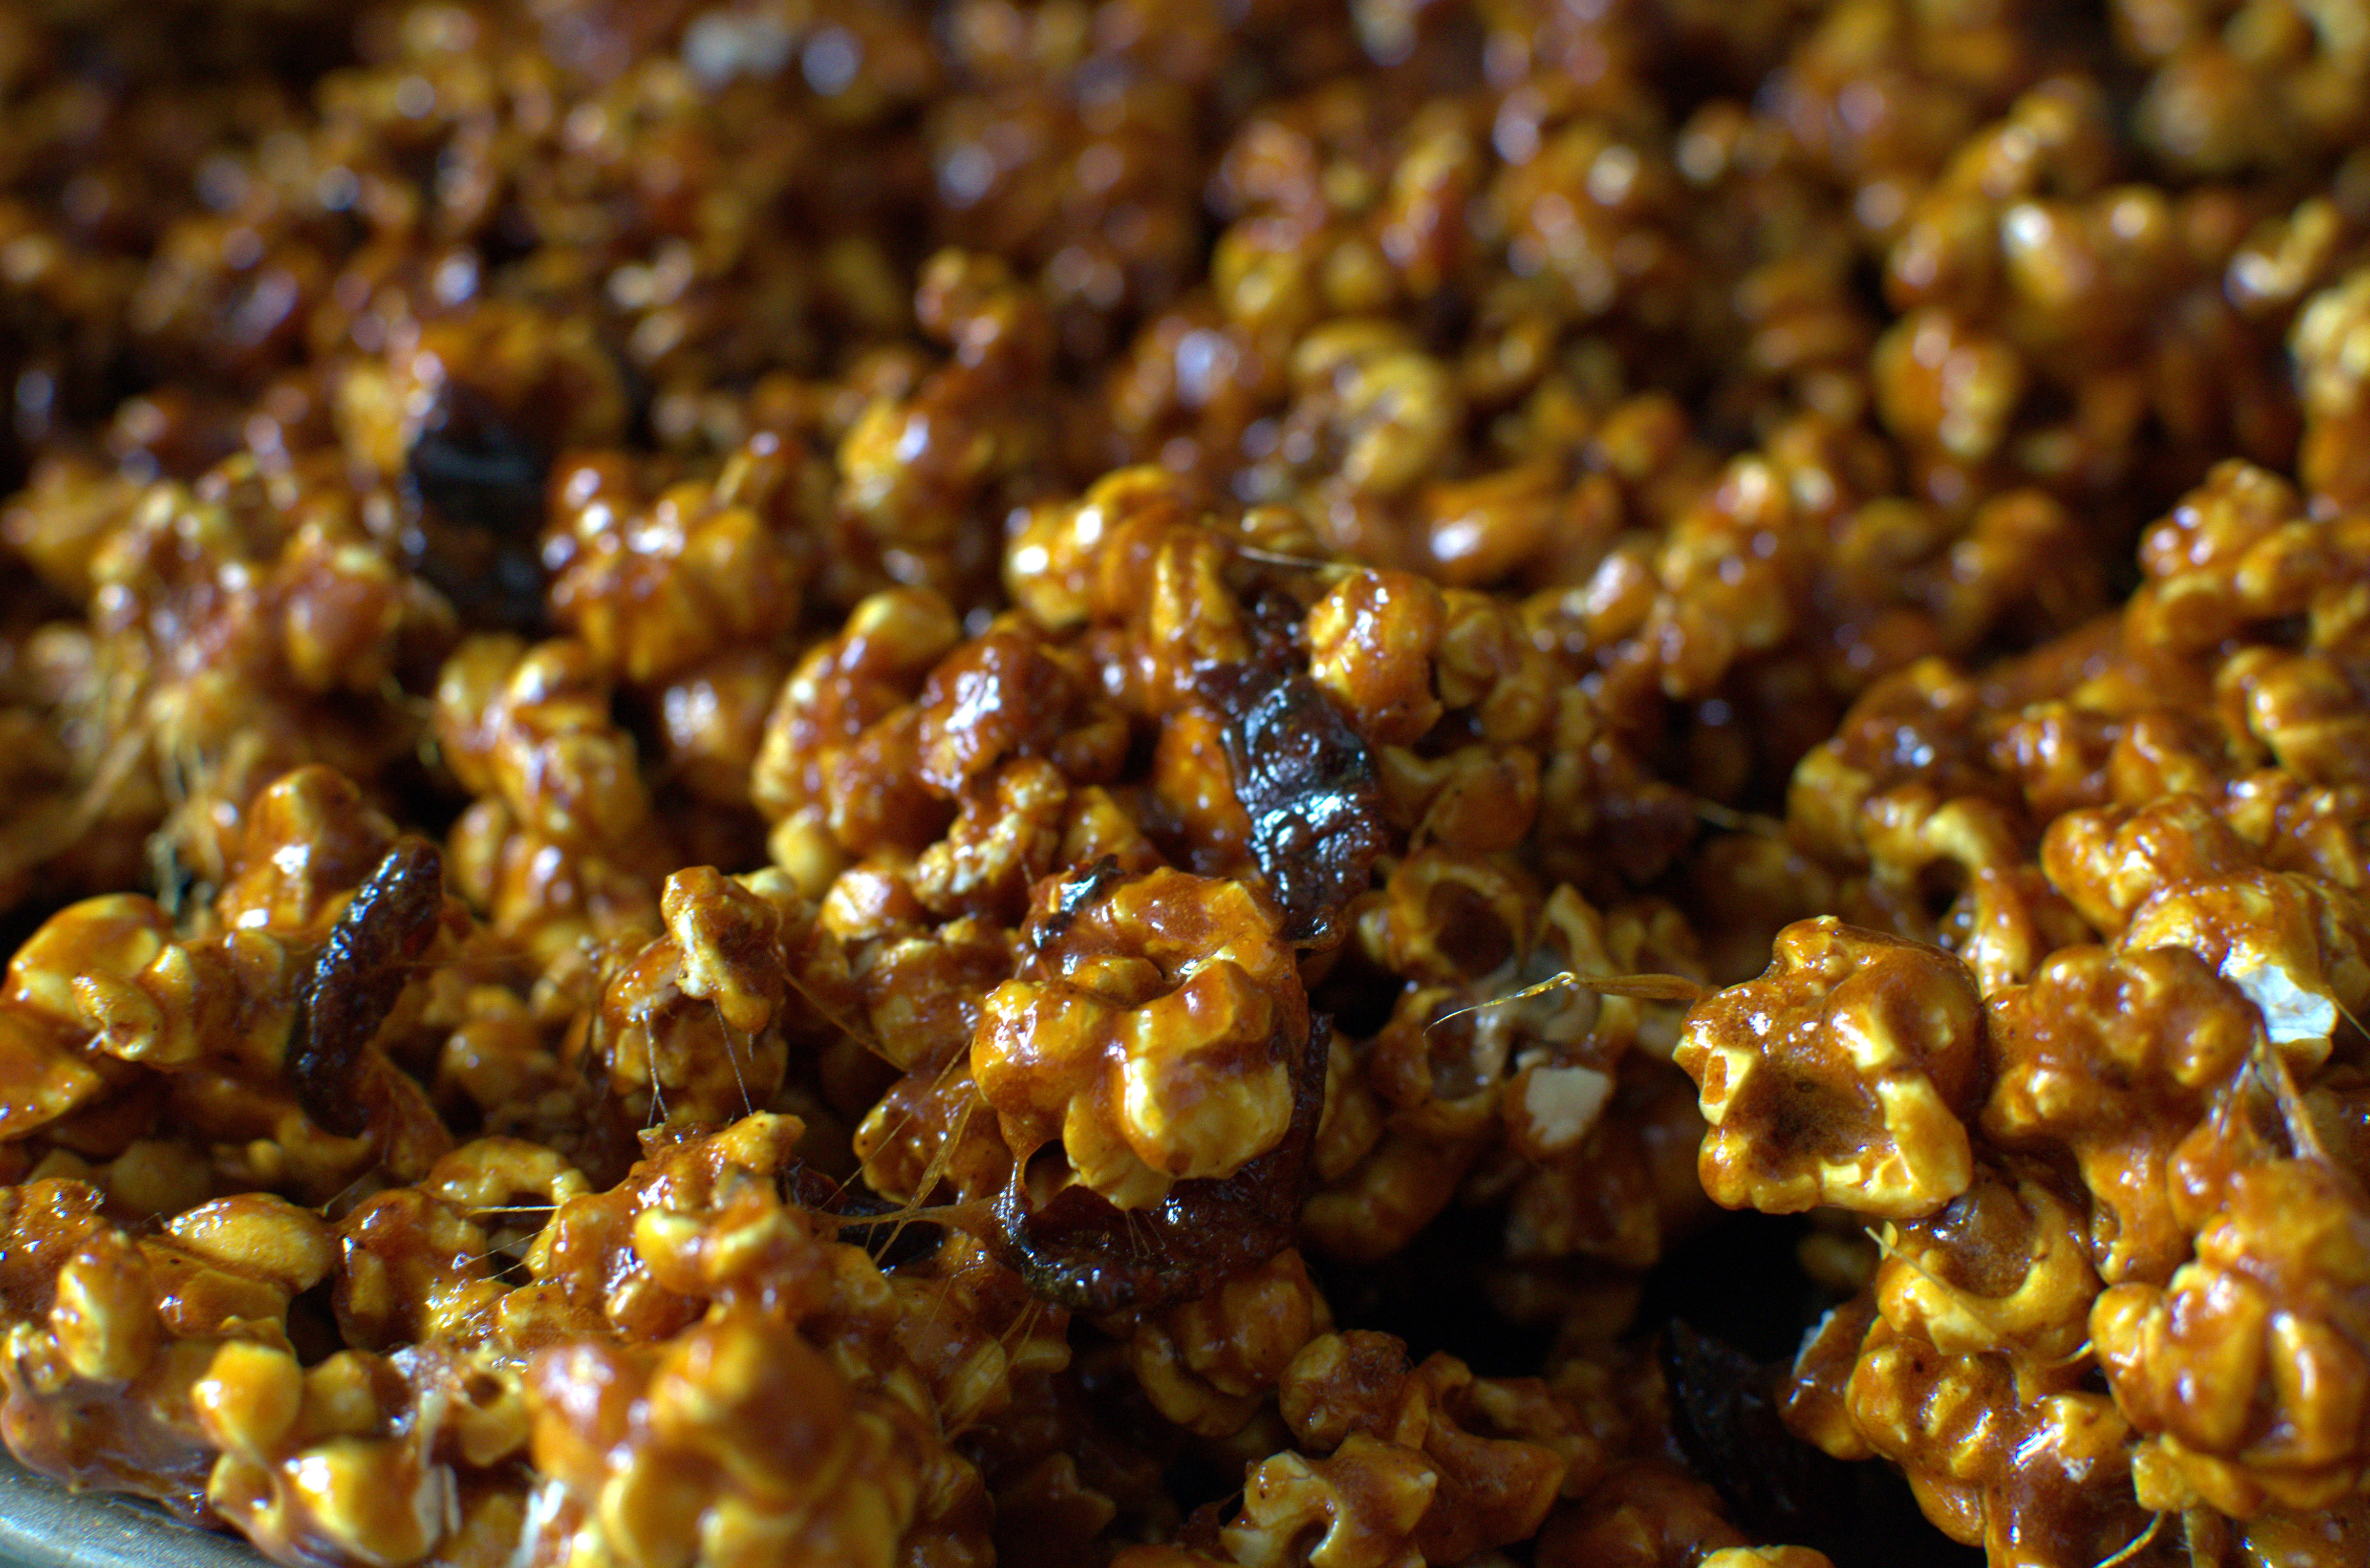 Spicy Caramel Bacon Popcorn Recipe | A Side of Sweet